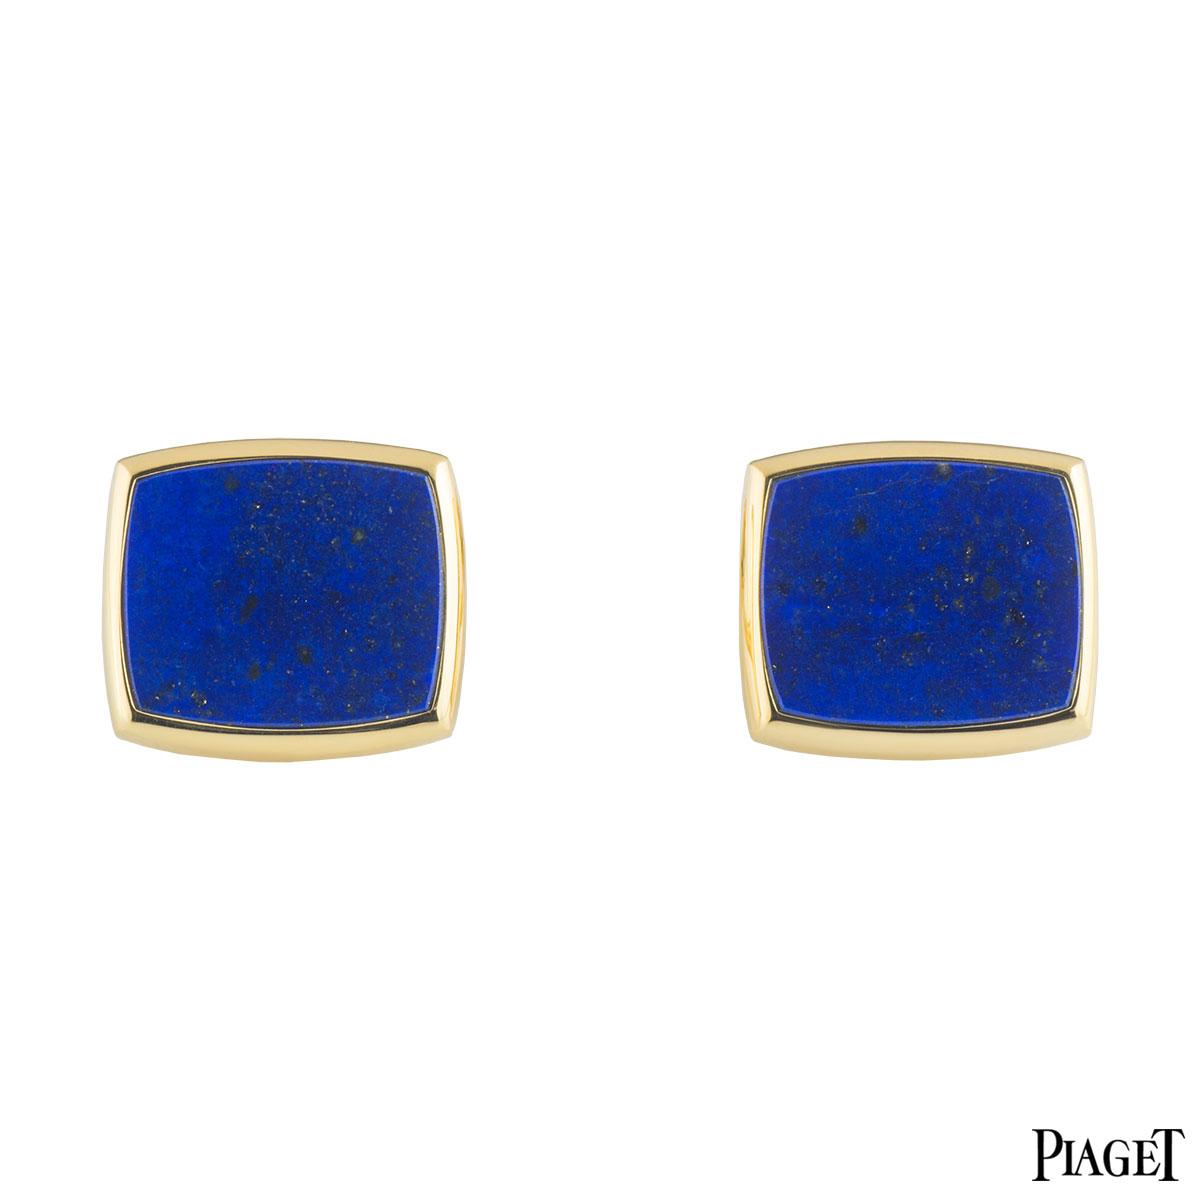 Piaget Yellow Gold Lapis Lazuli Cufflinks